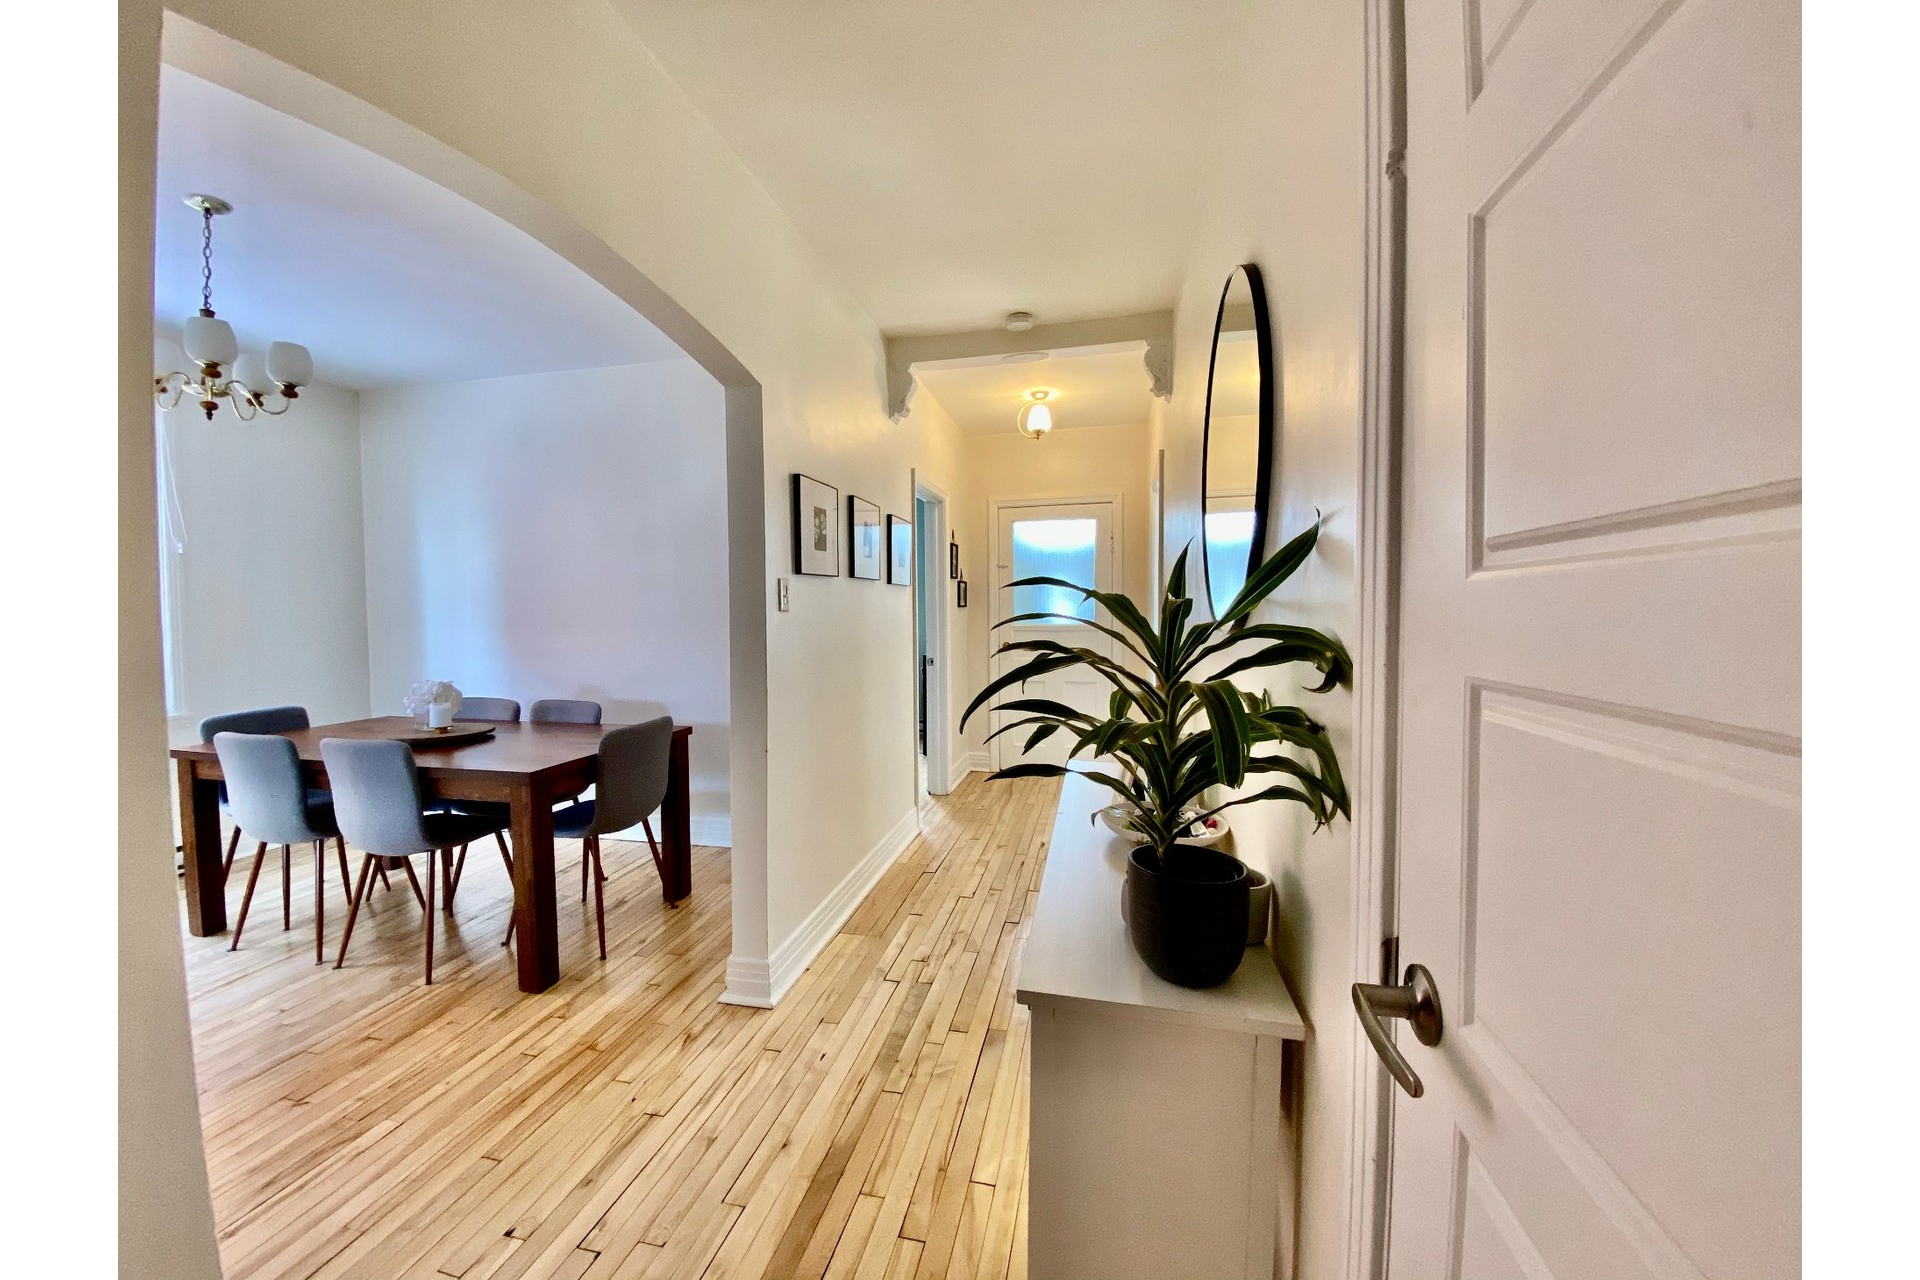 image 19 - Duplex En venta Lachine Montréal  - 6 habitaciones